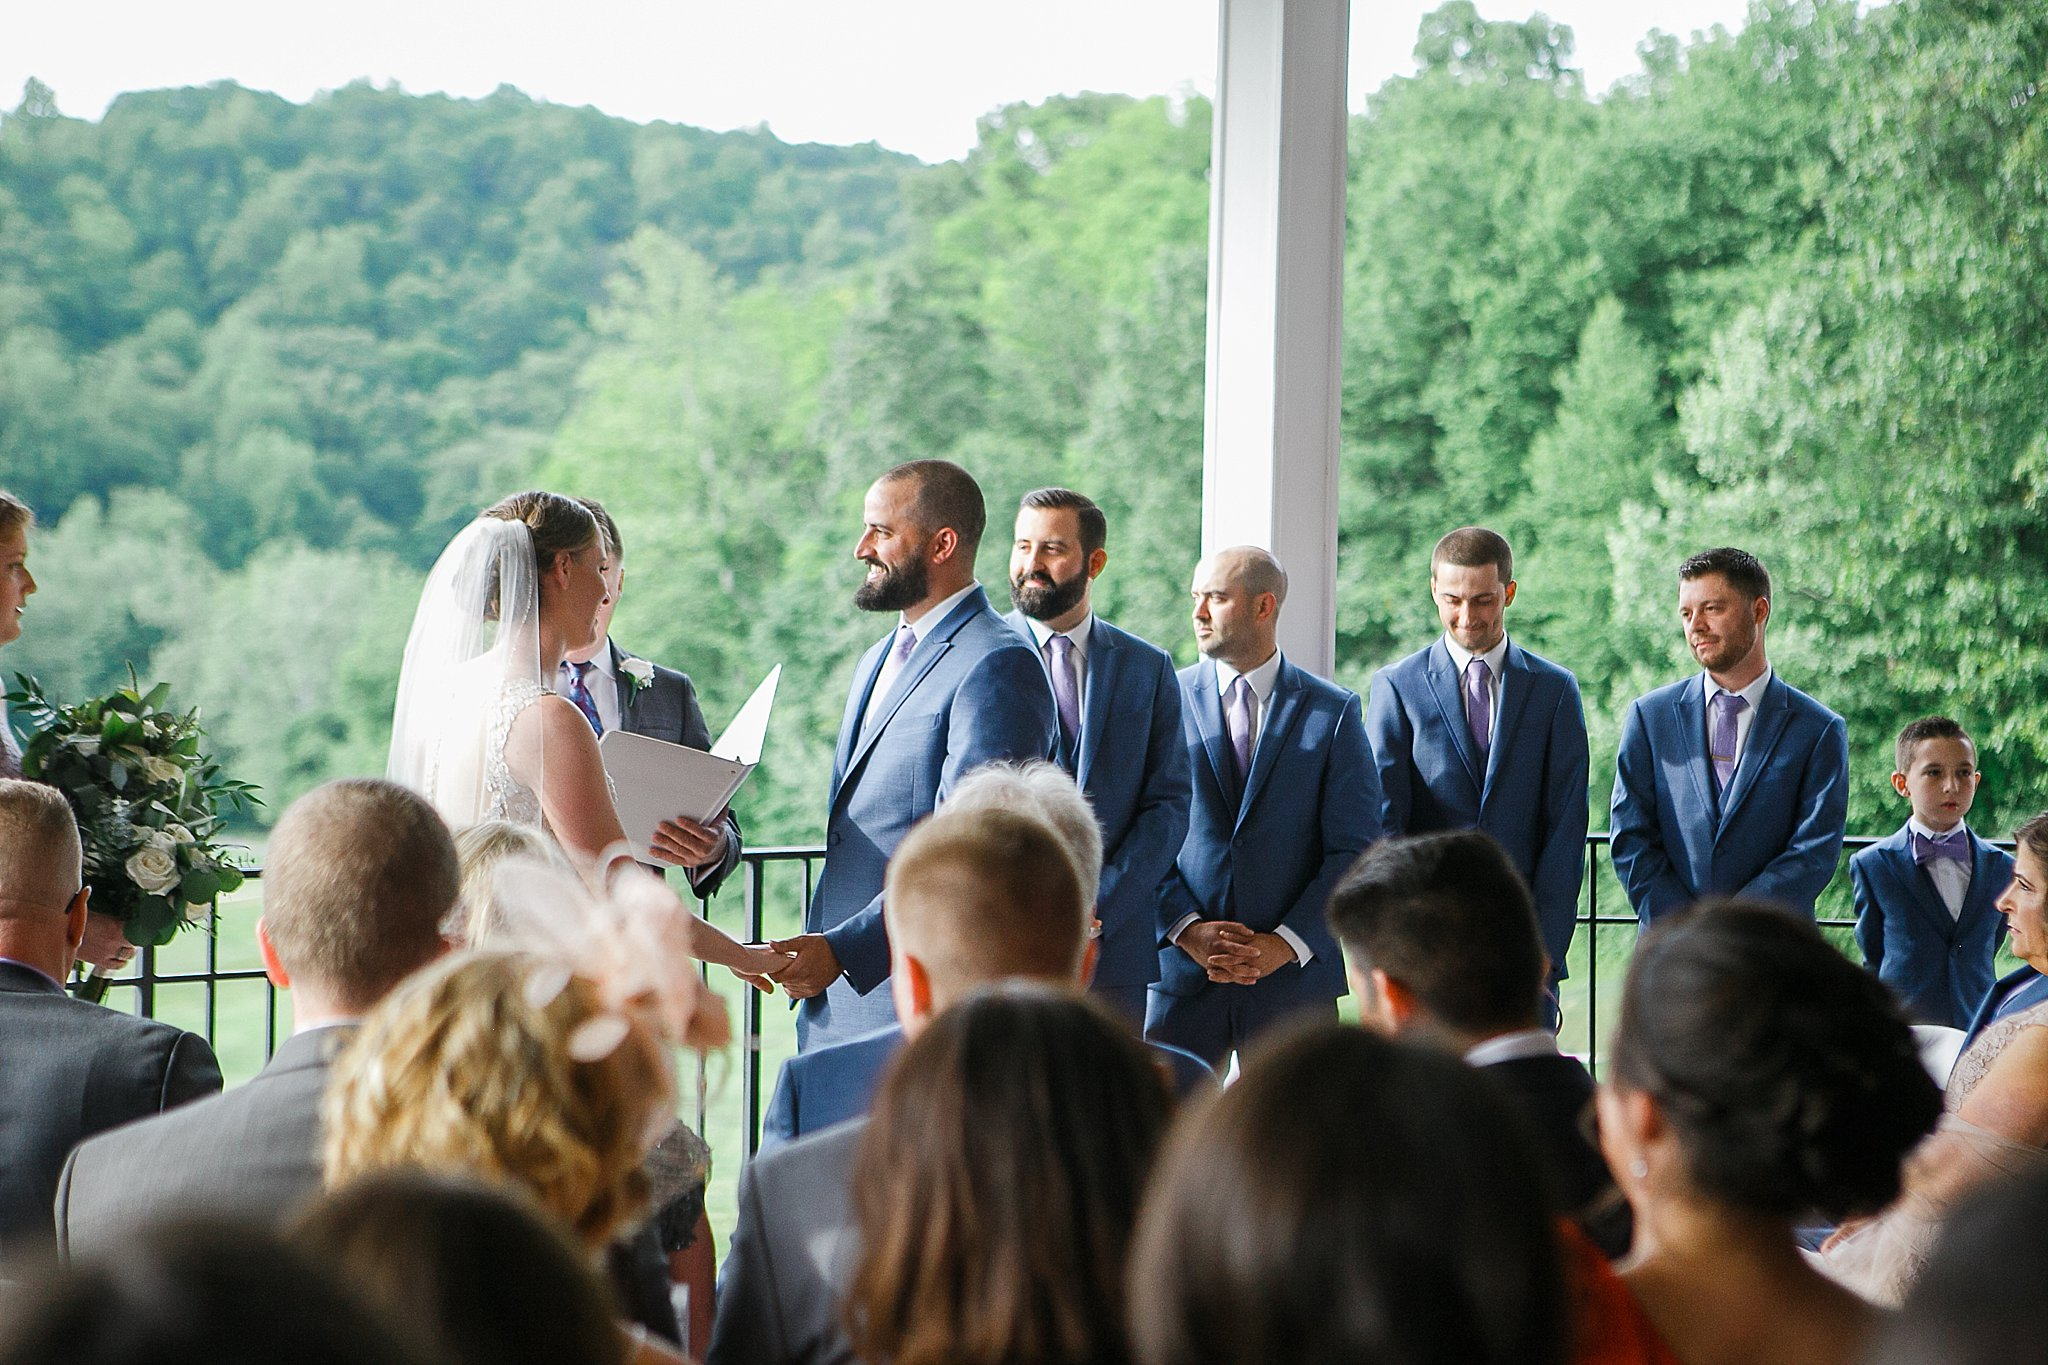 Hollow Brook Golf Club Cortlandt Manor NY Wedding Sweet Alice Photography June Wedding78.jpg